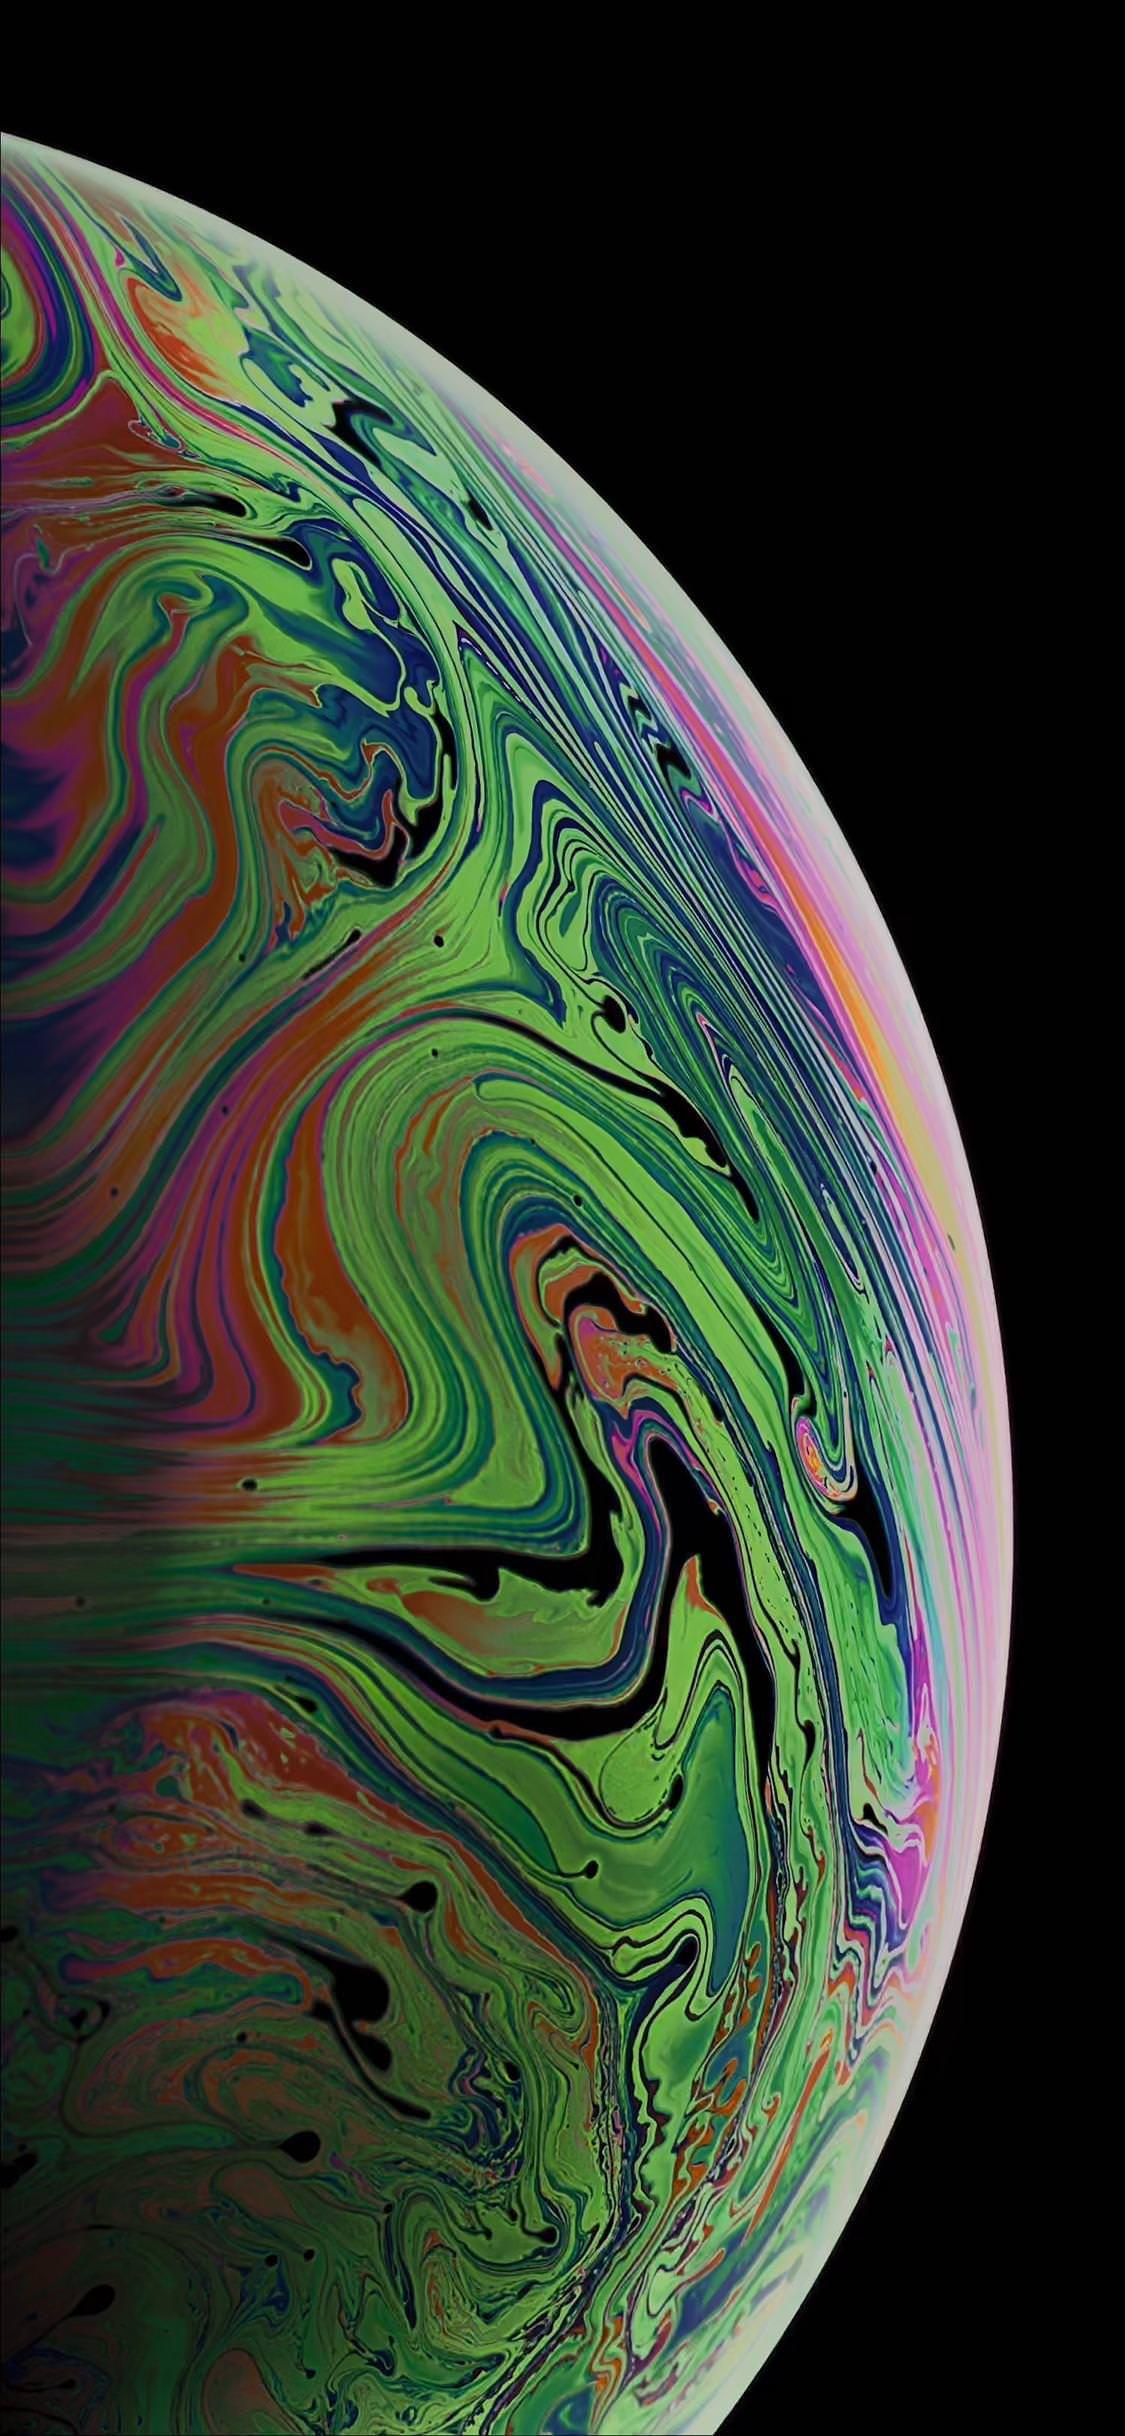 Pin on Apple wallpaper iphone